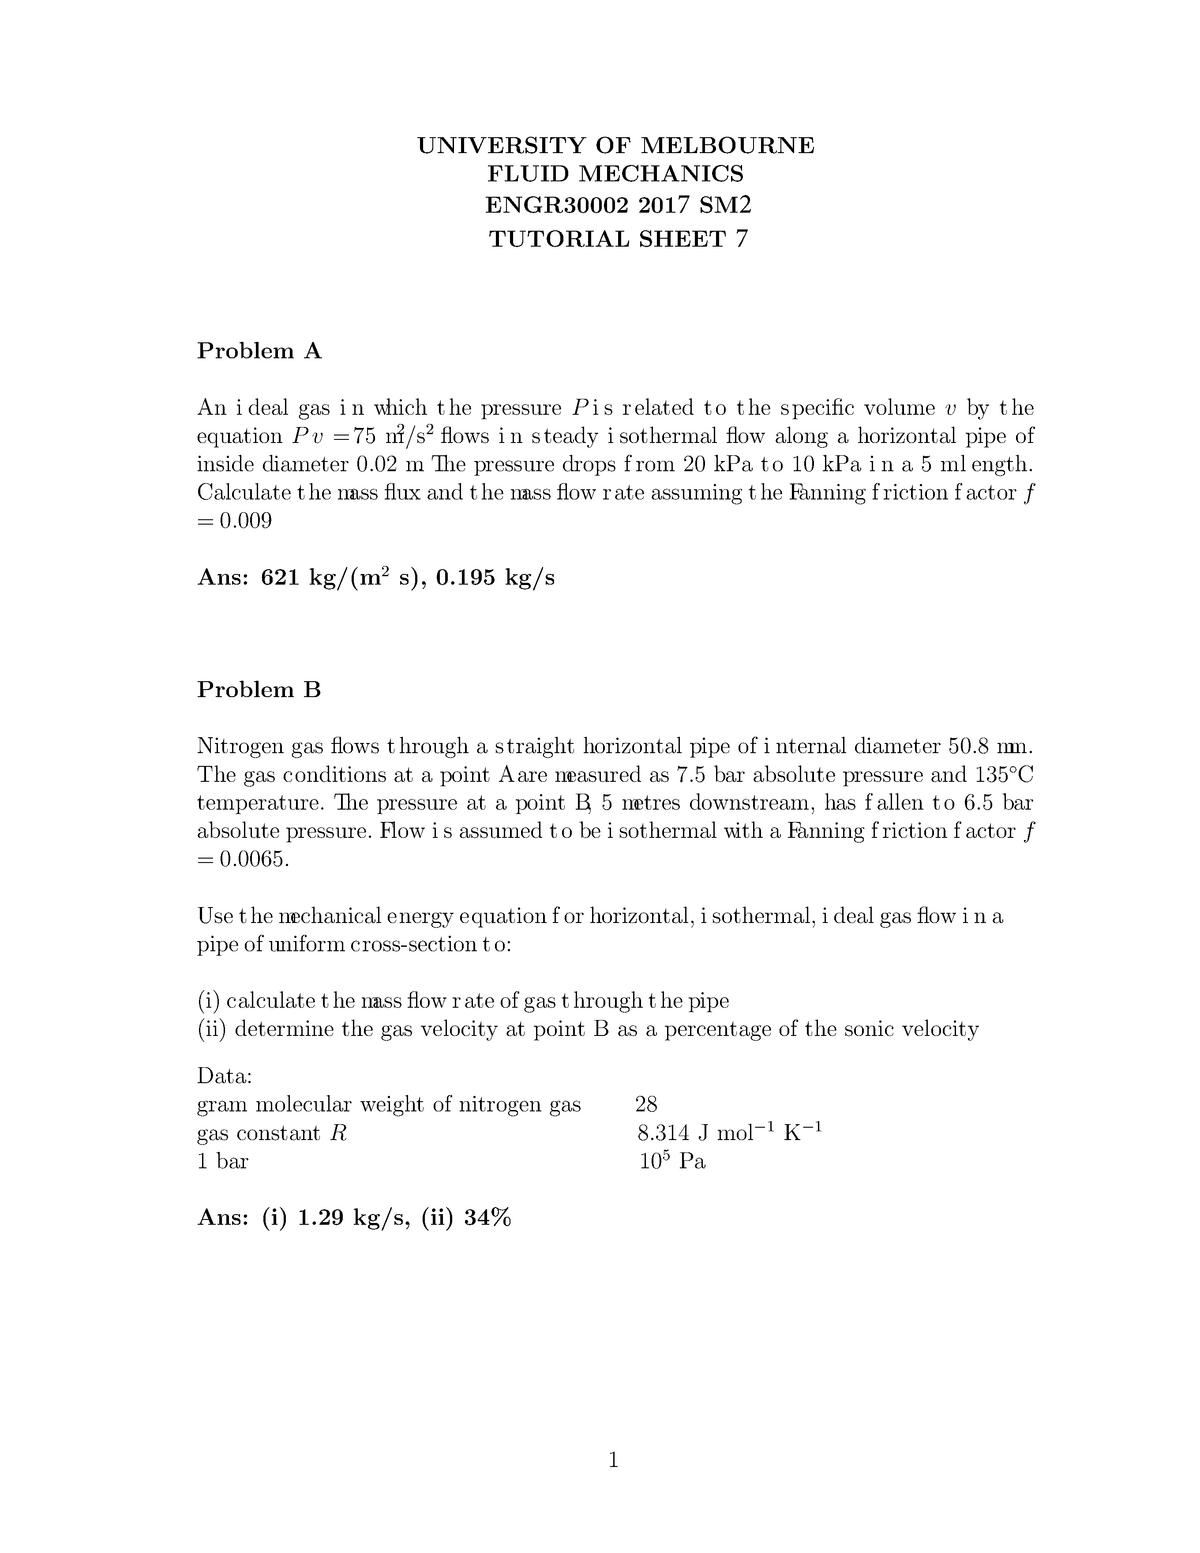 Tutorial sheet 7 - ENGR30002: Fluid Mechanics - StuDocu